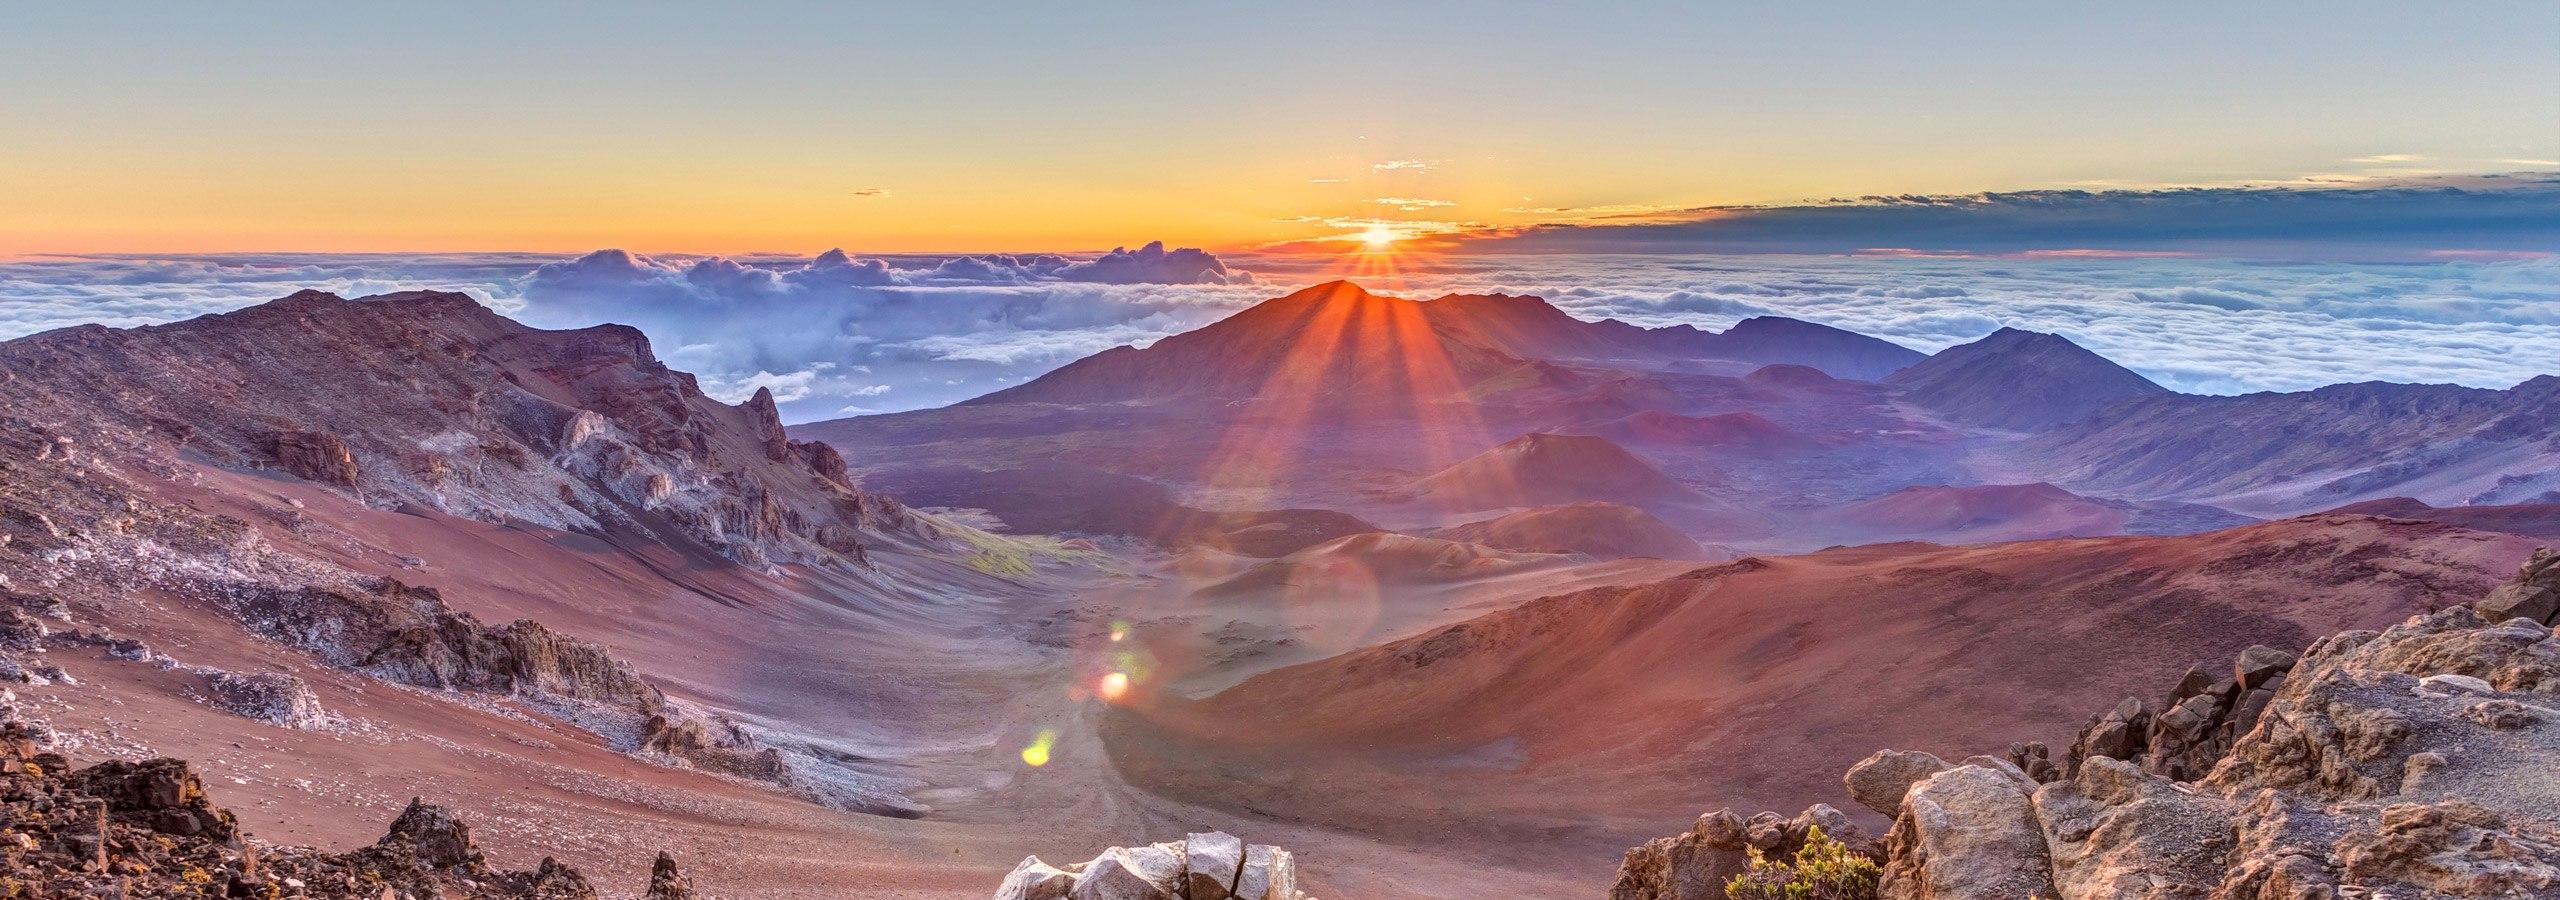 Maui Volcano Sunrise View Header